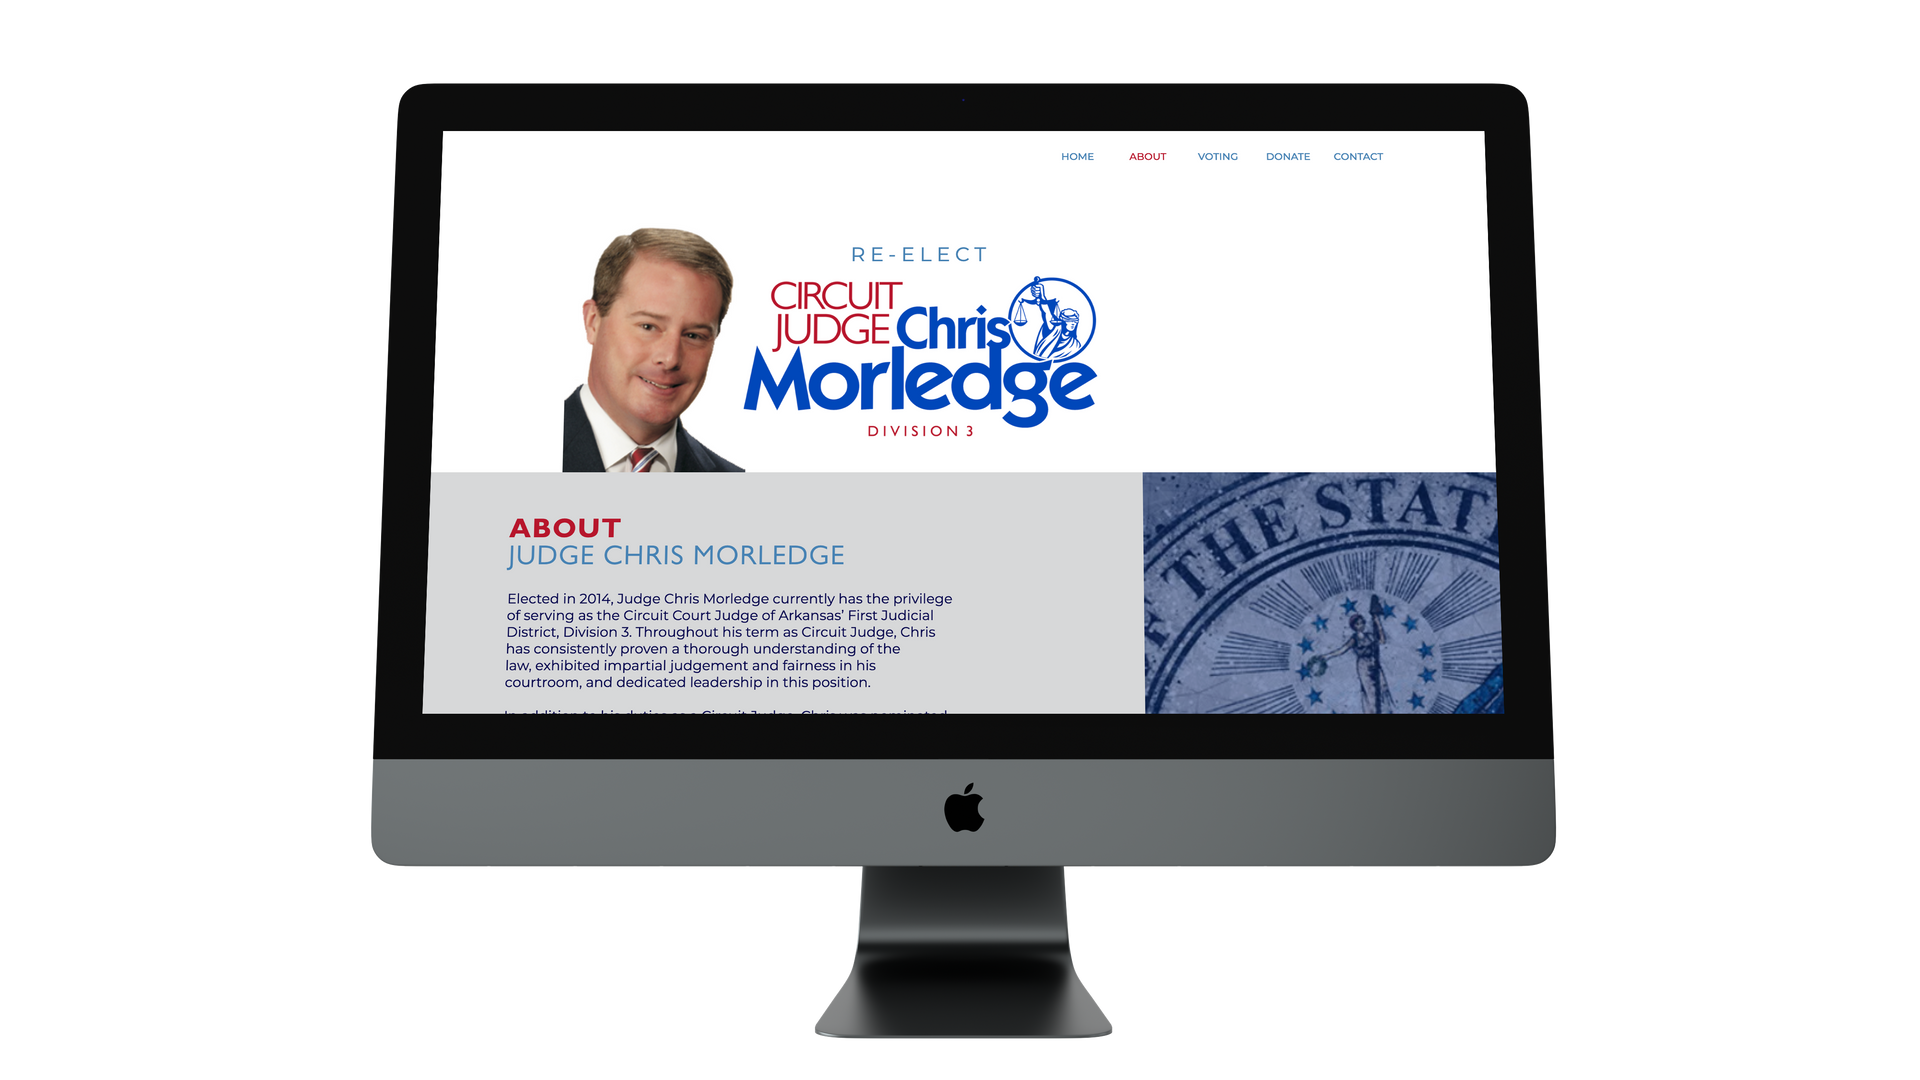 Judge Chris Morledge